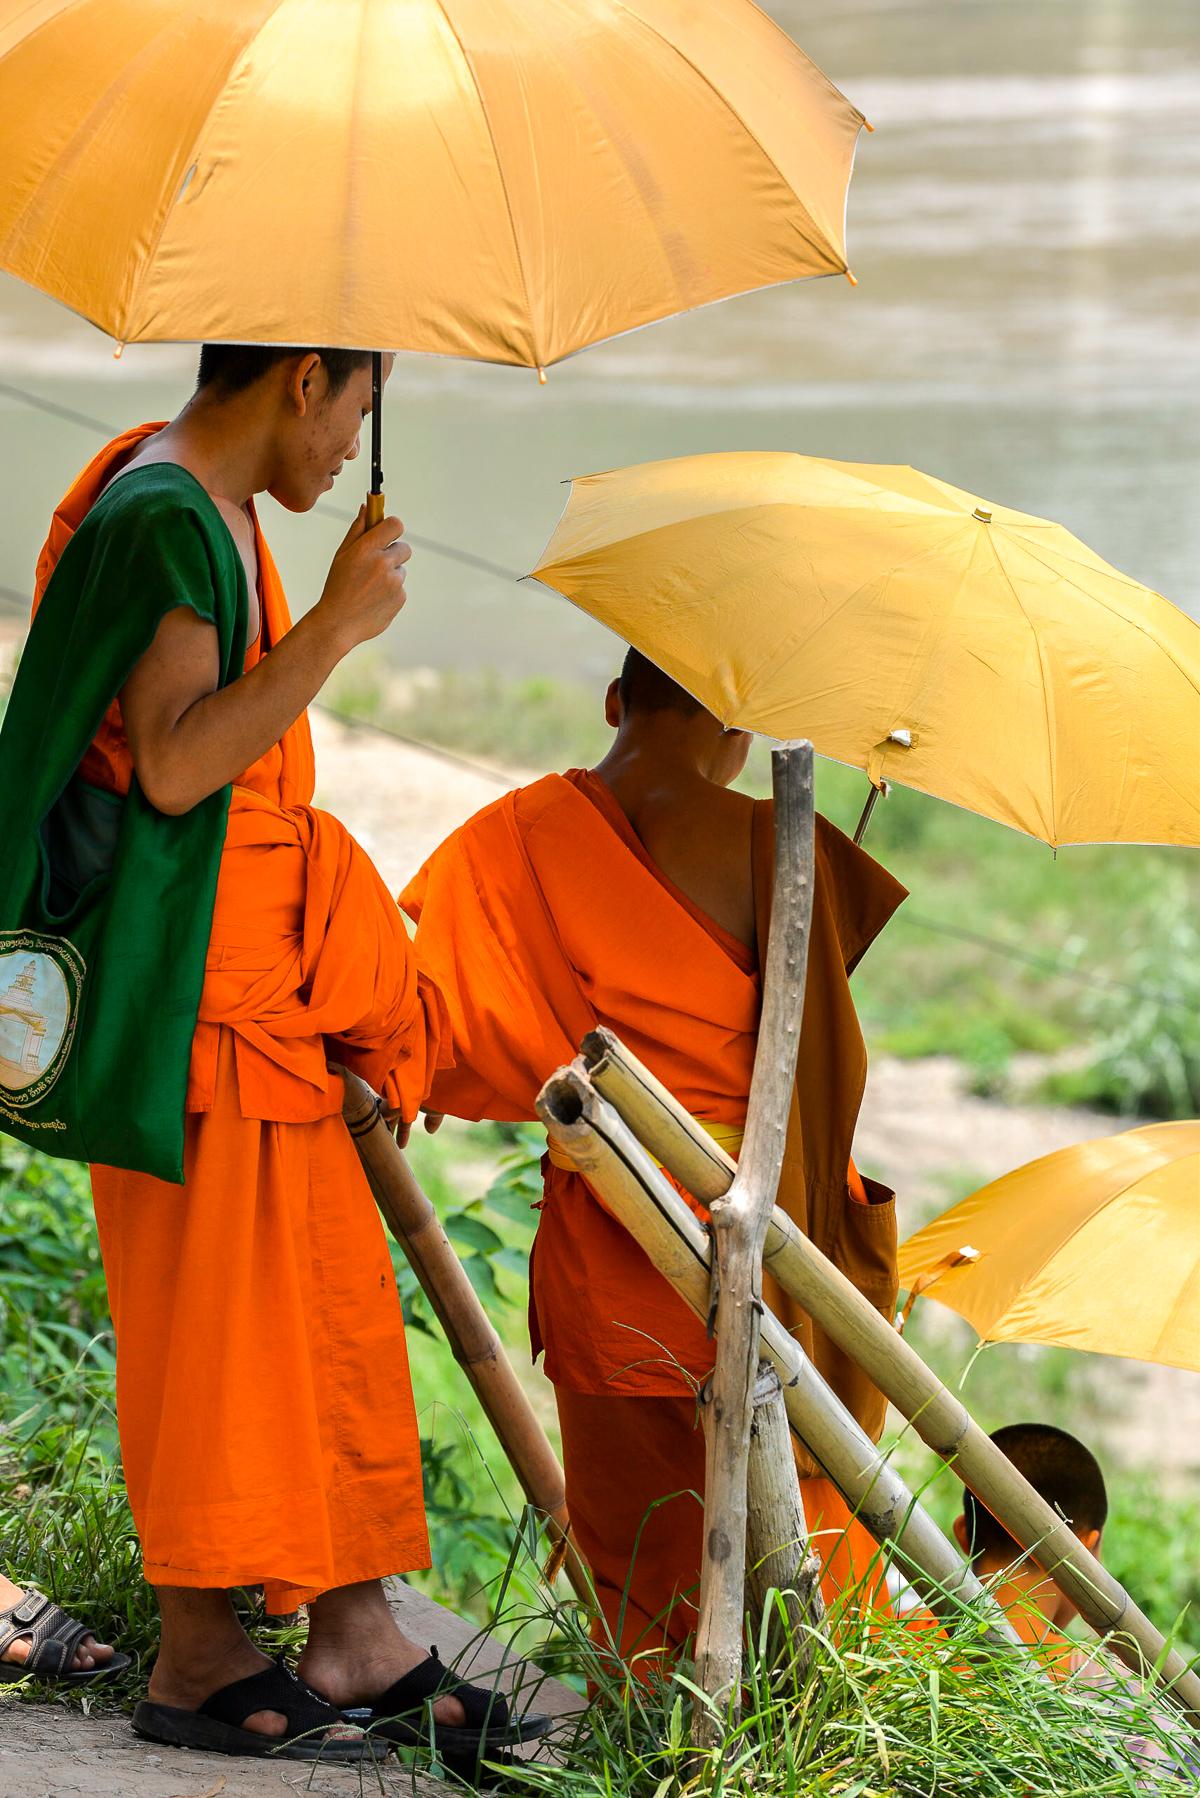 Stacie Flinner 3 Nagas Complete Guide to Luang Prabang-136.jpg